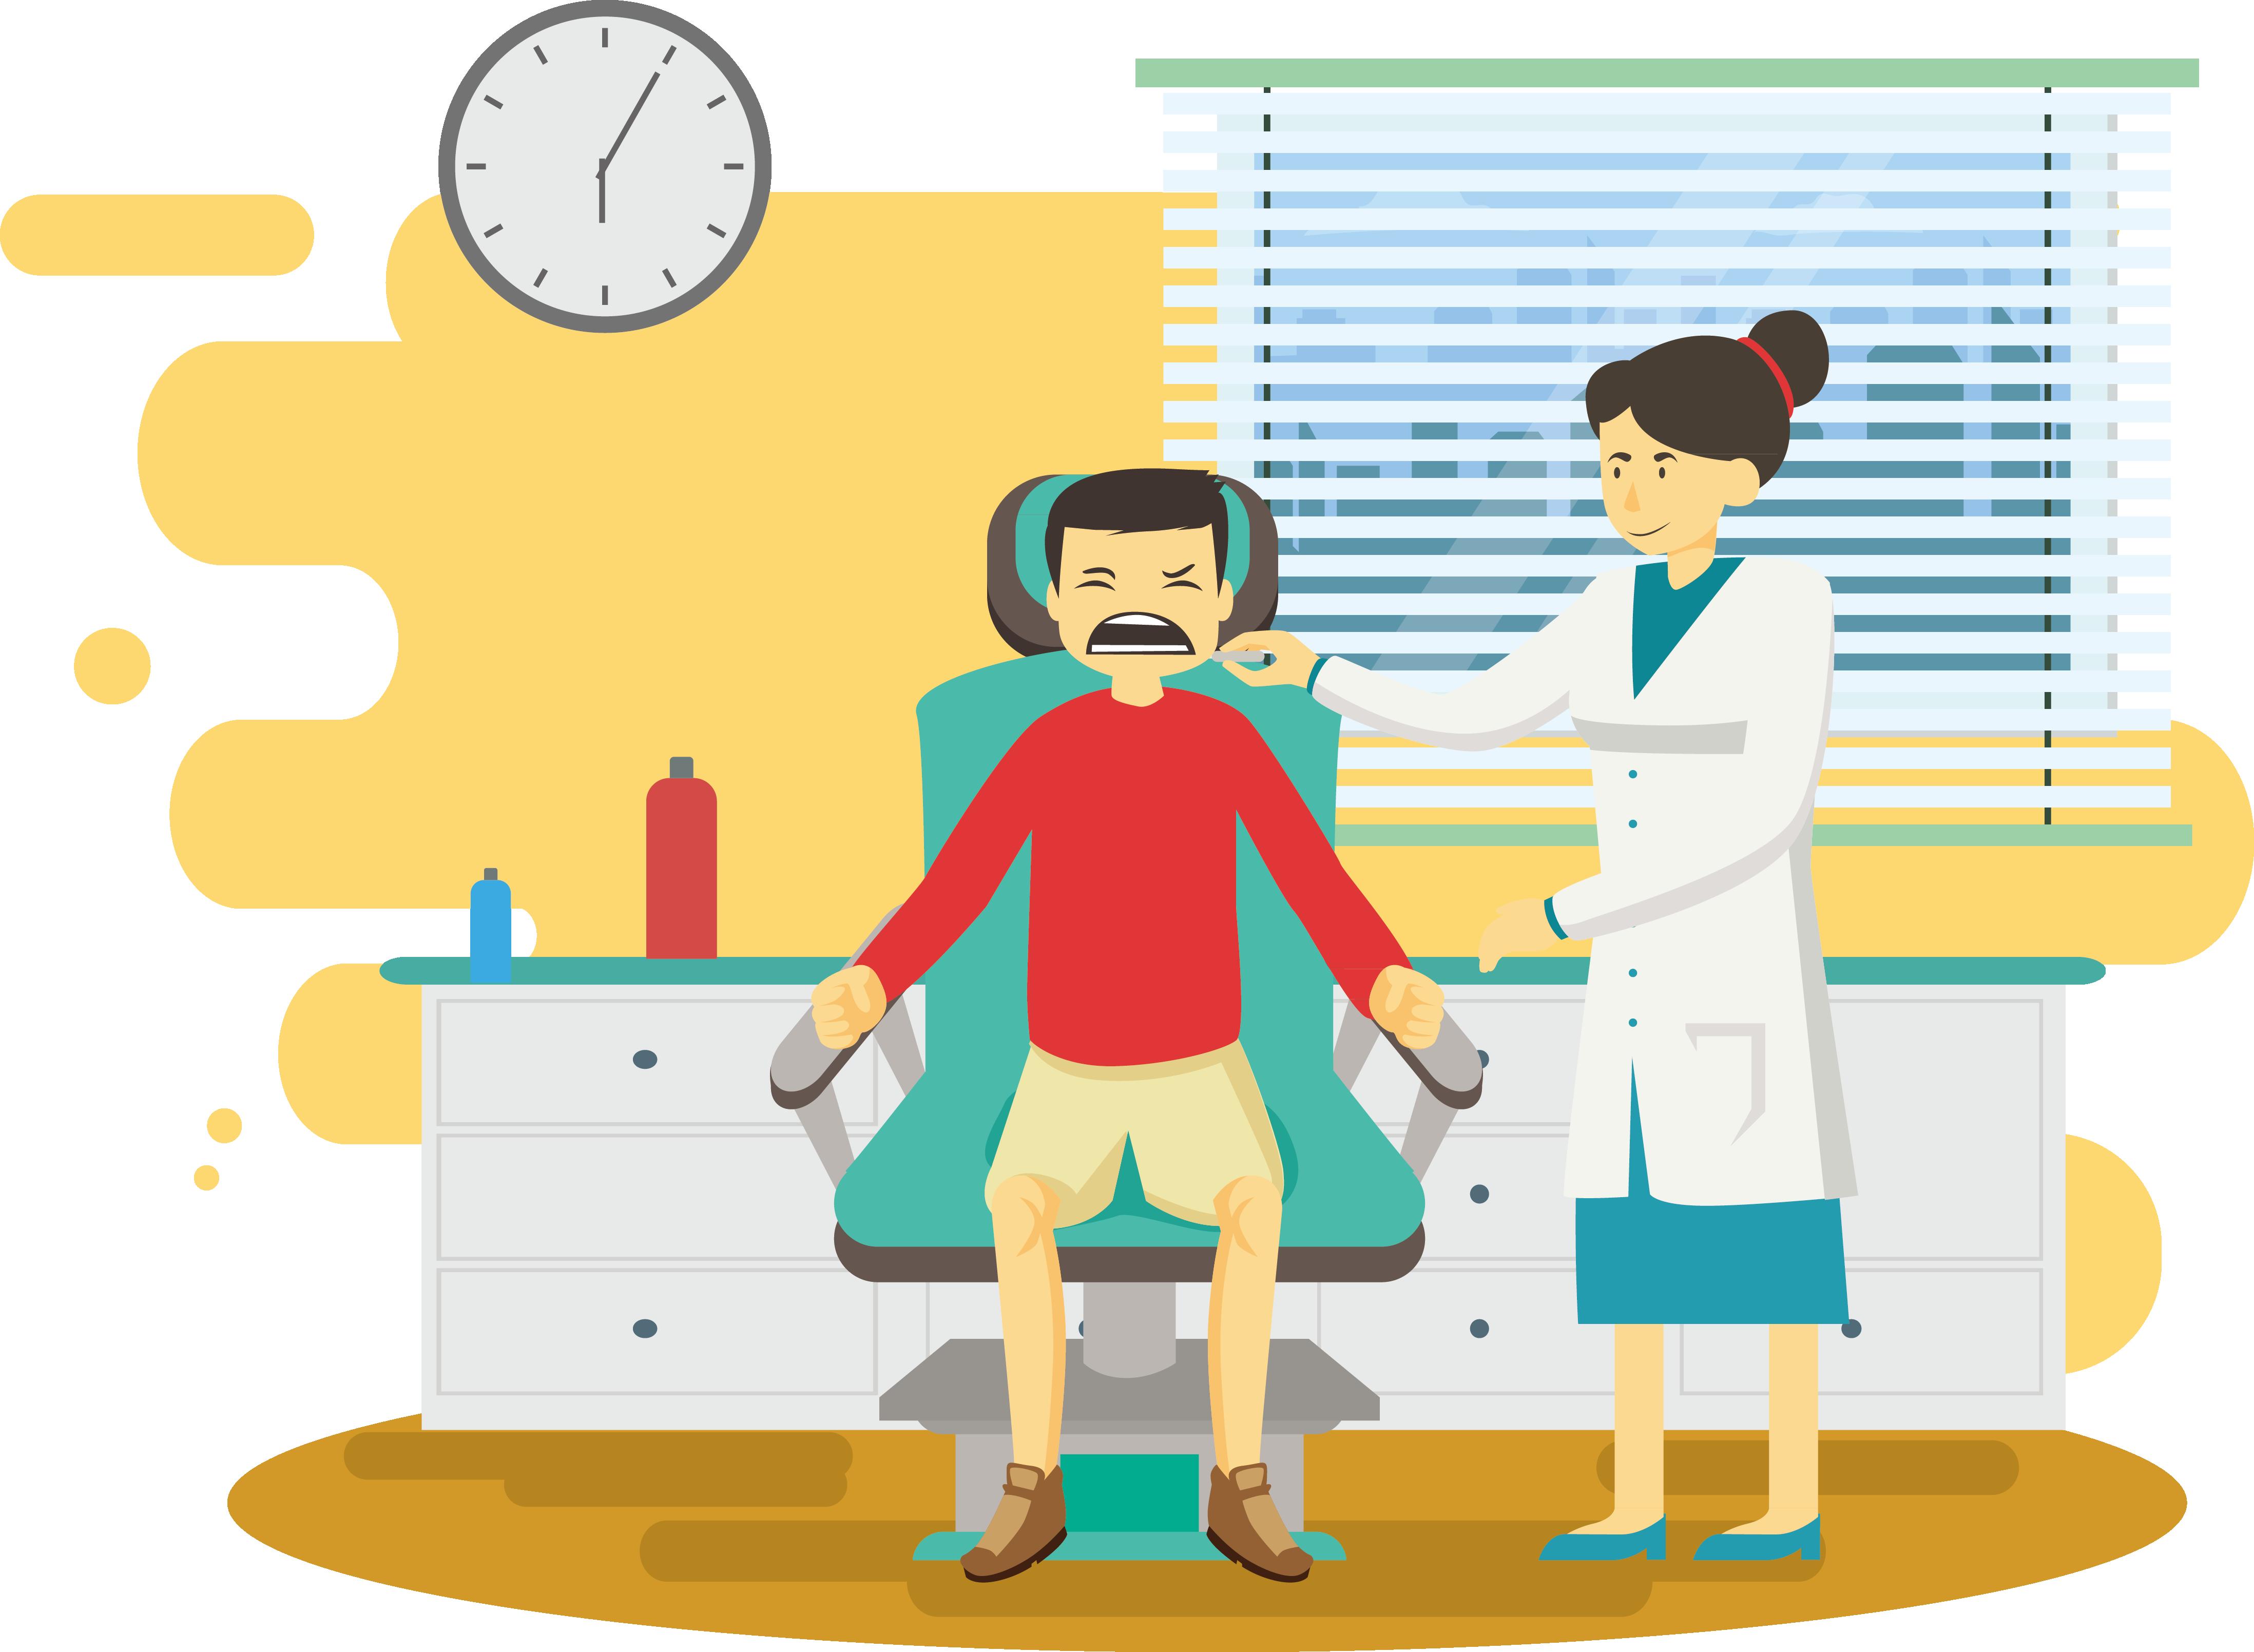 Doctors clipart dentist. Physician illustration room hygiene